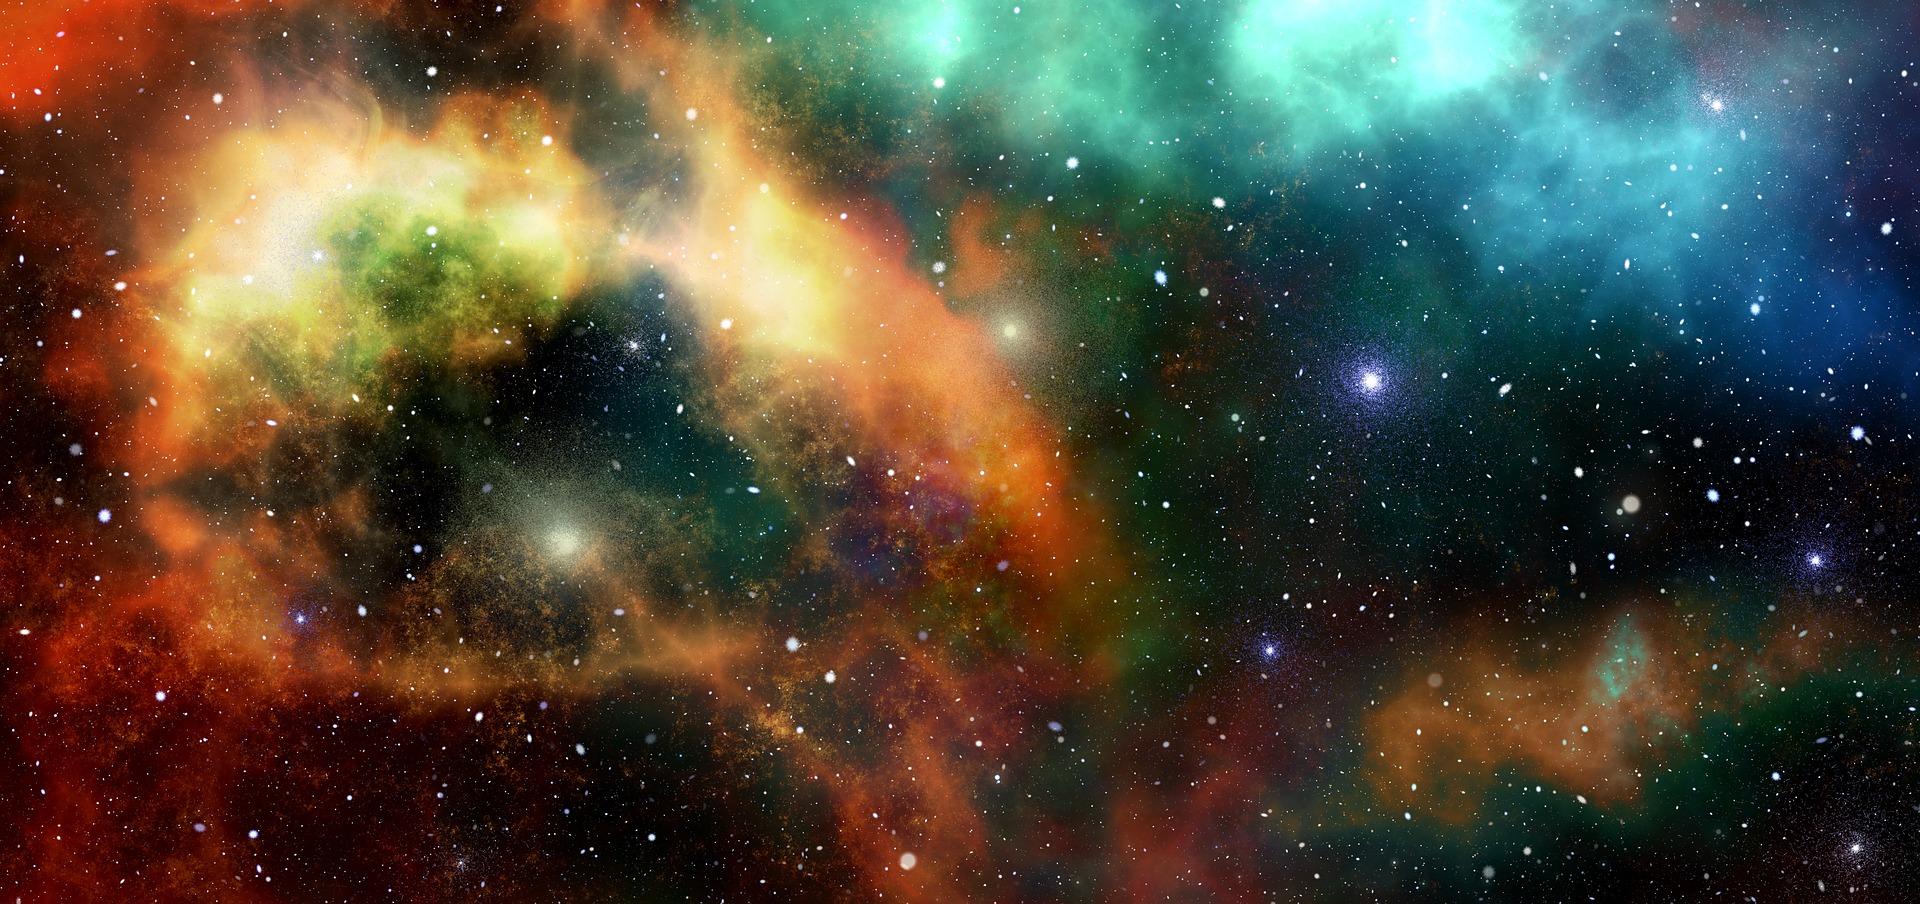 universe-2742113_1920.jpg